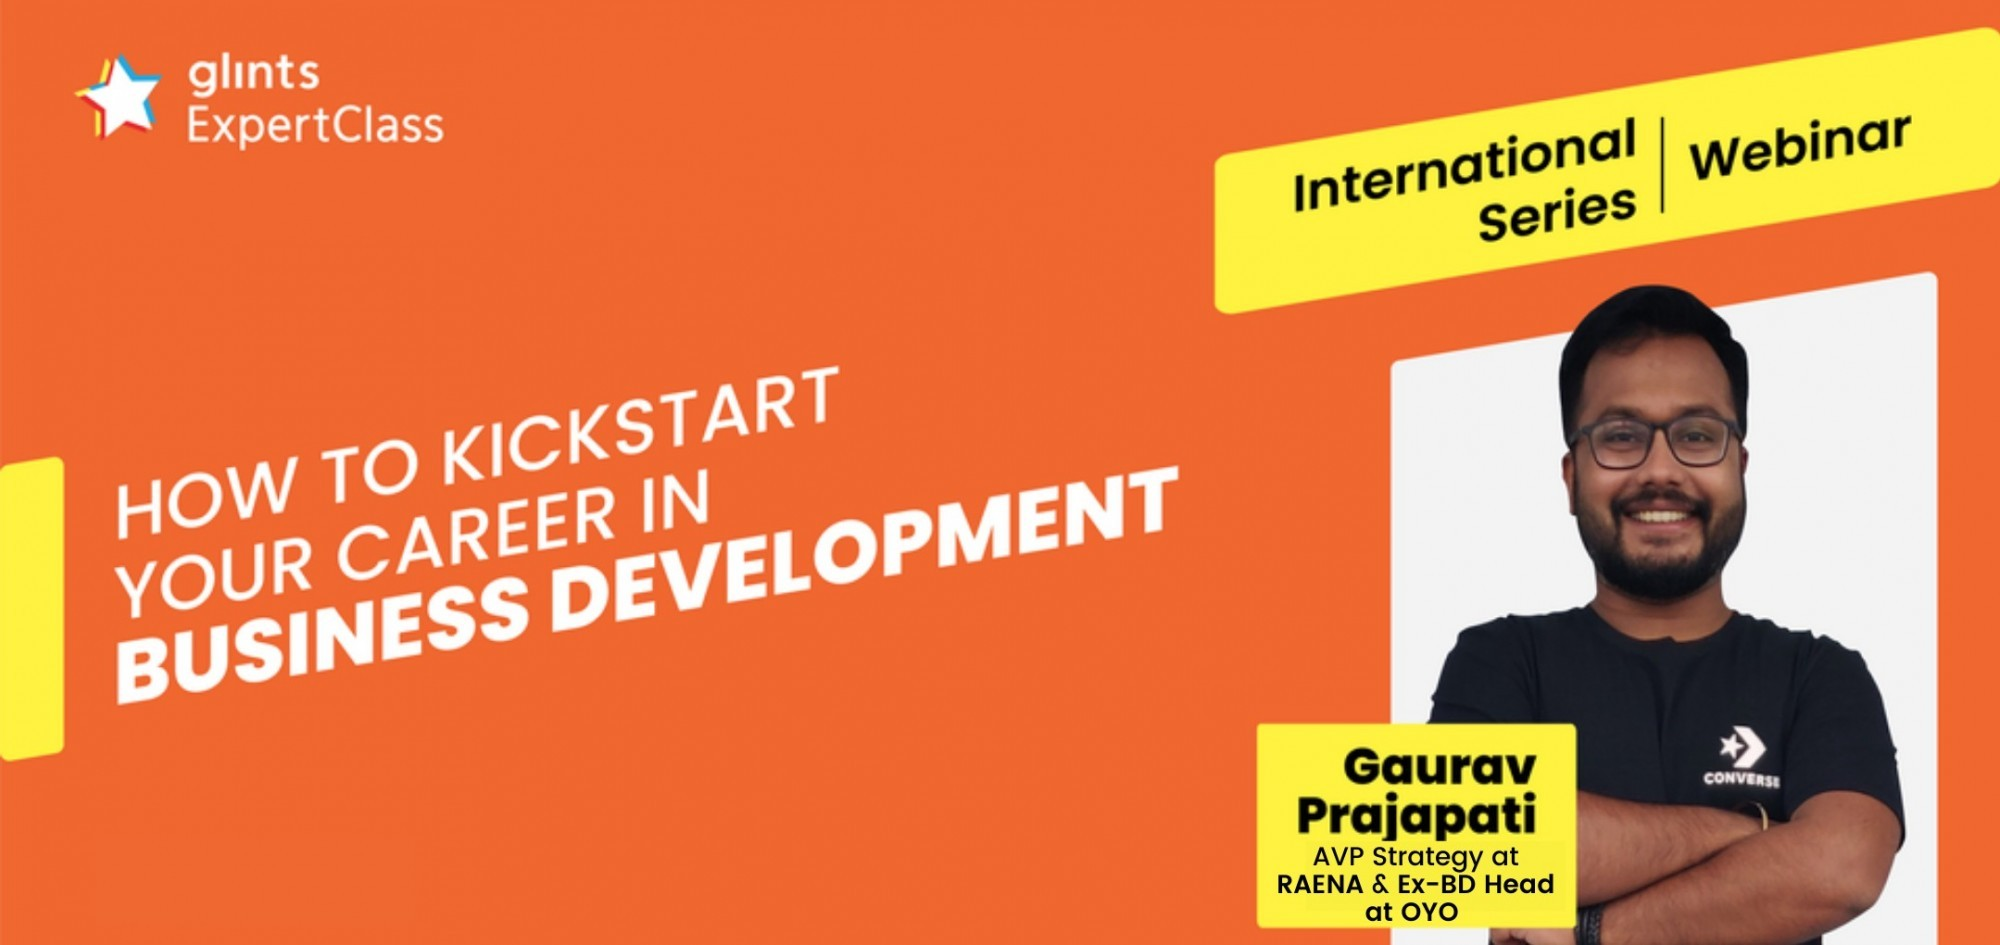 [Glints - GEC International Series] How to Kickstart Your Career in Business Development